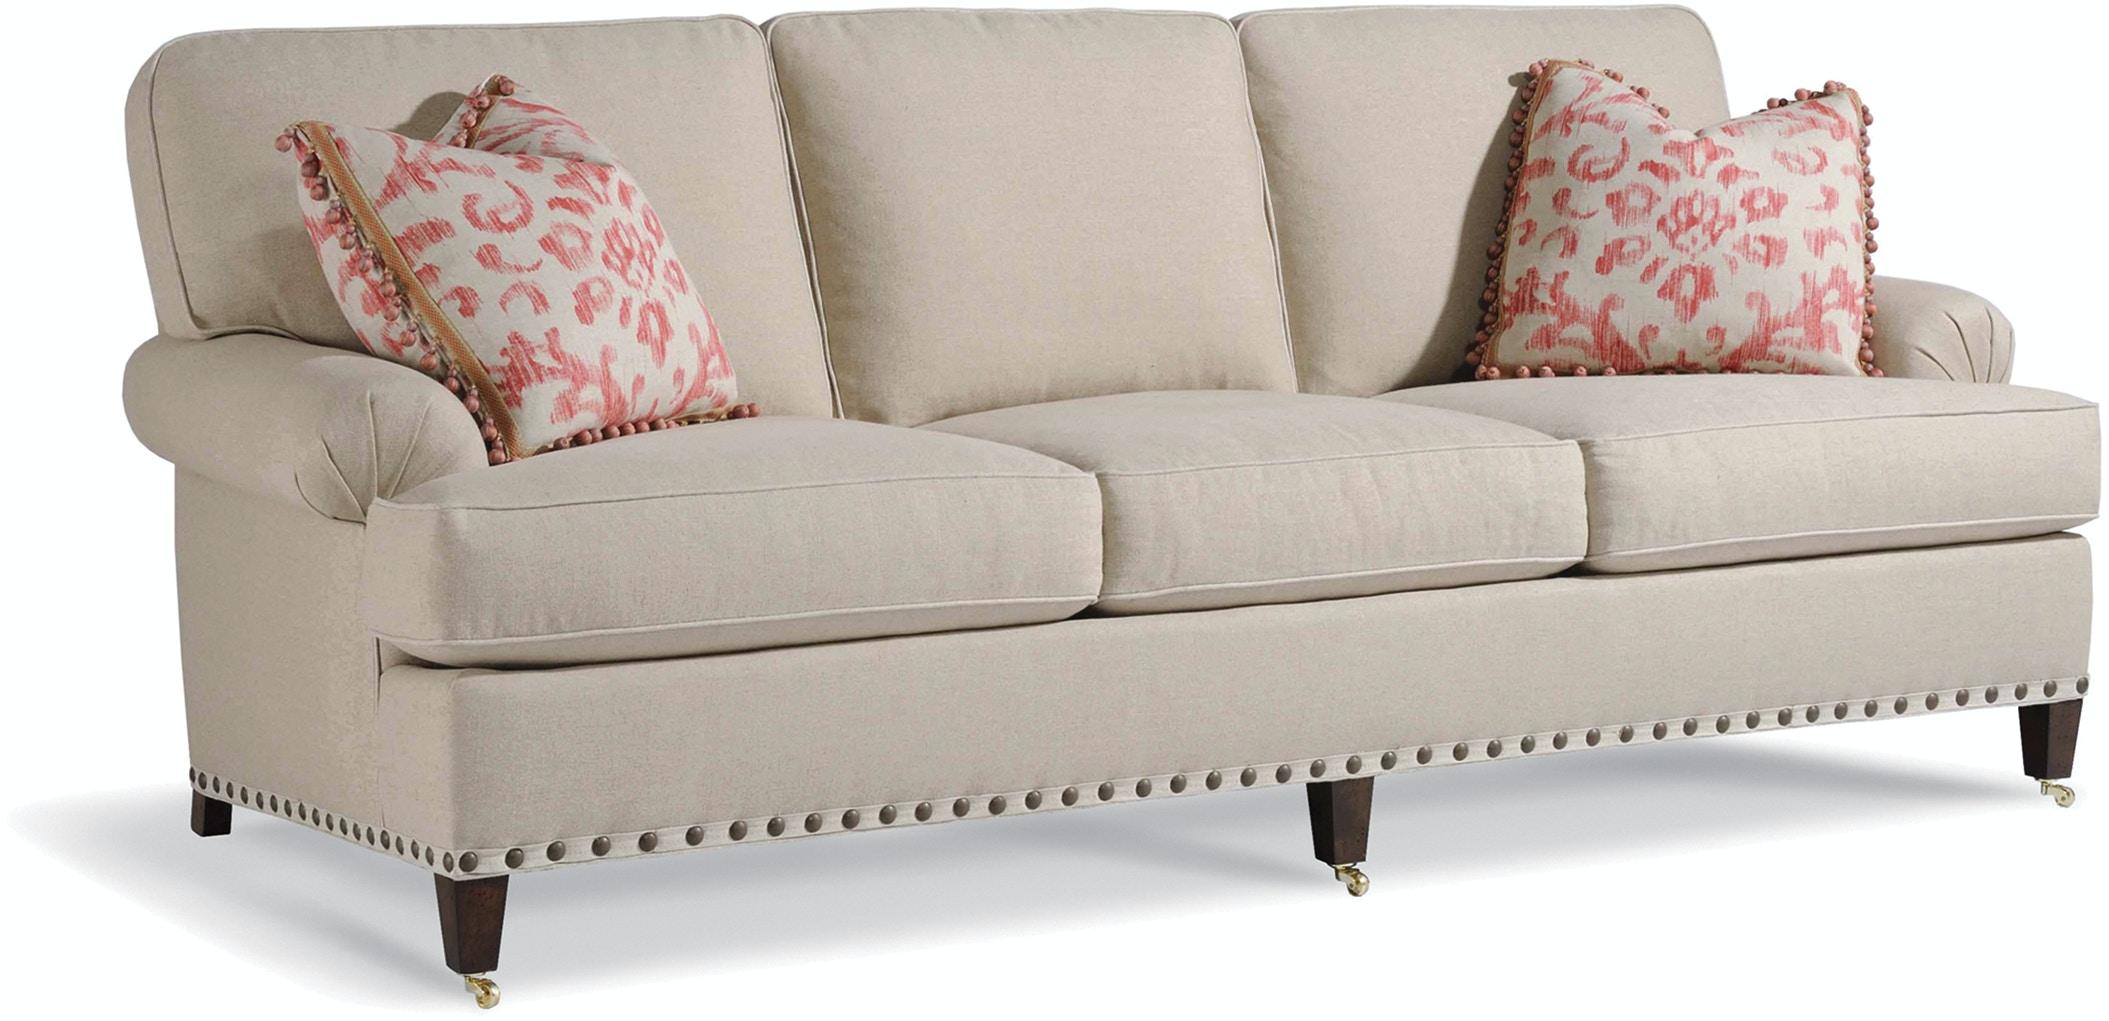 King Sofa Hickory Katherine Sofa TheSofa : taylor king furniture 8112 03cl from thesofa.droogkast.com size 1024 x 768 jpeg 41kB